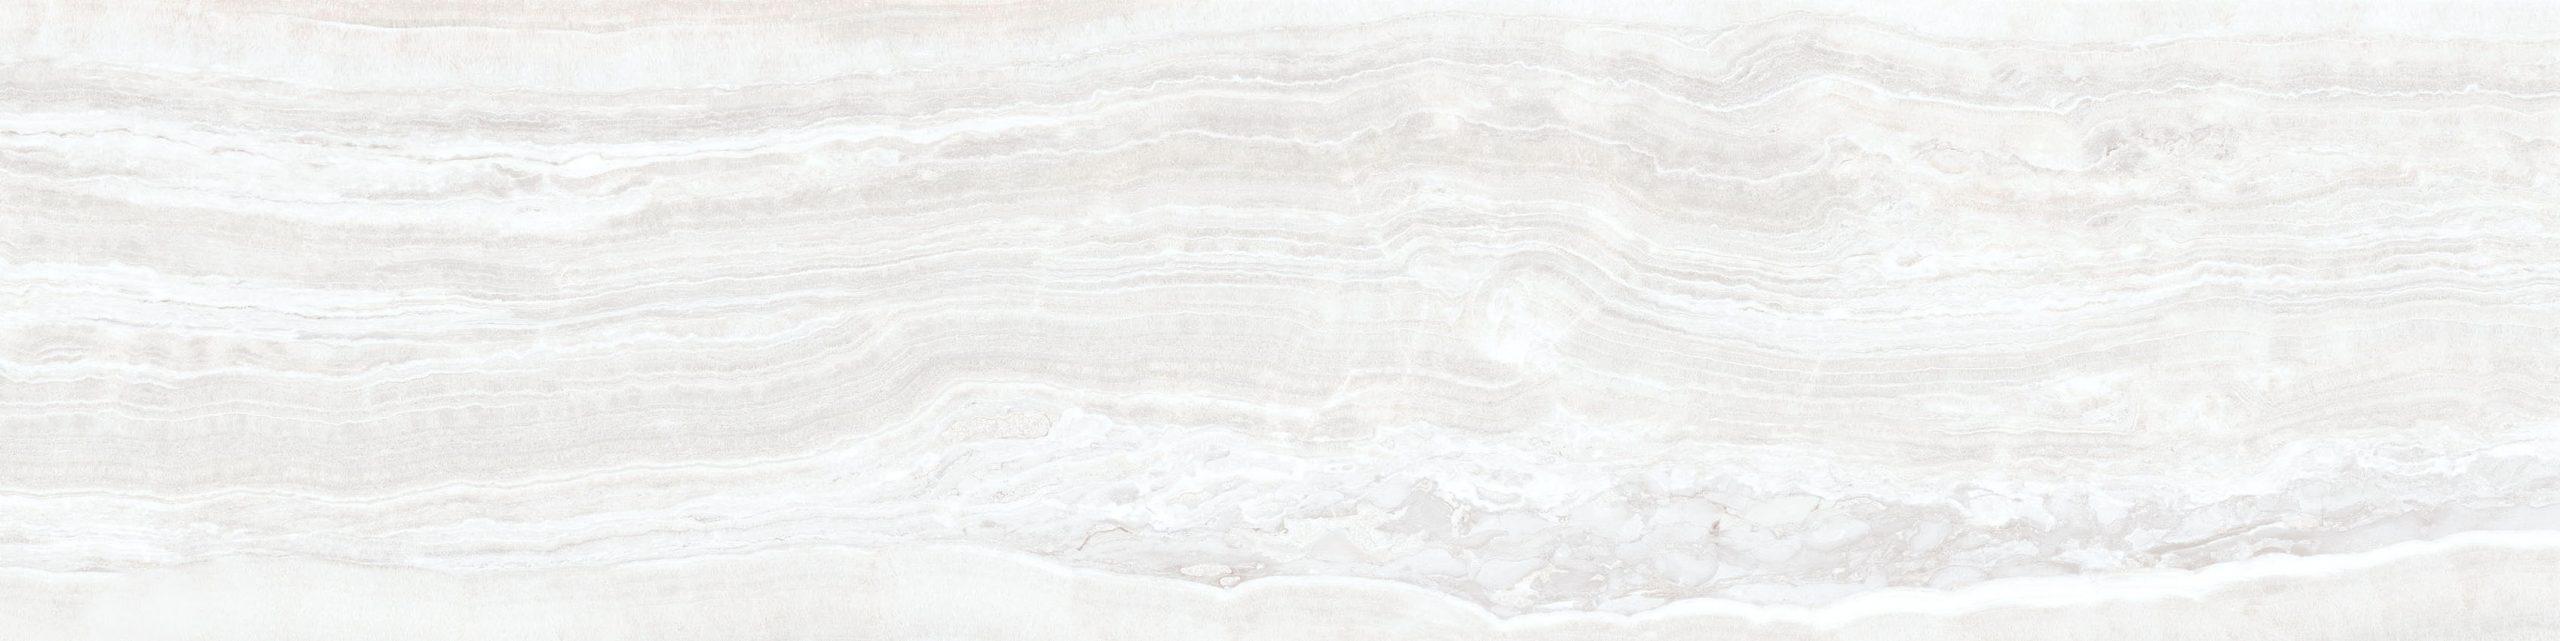 Onyx of Cerim White Glossy 10mm 30 x 120